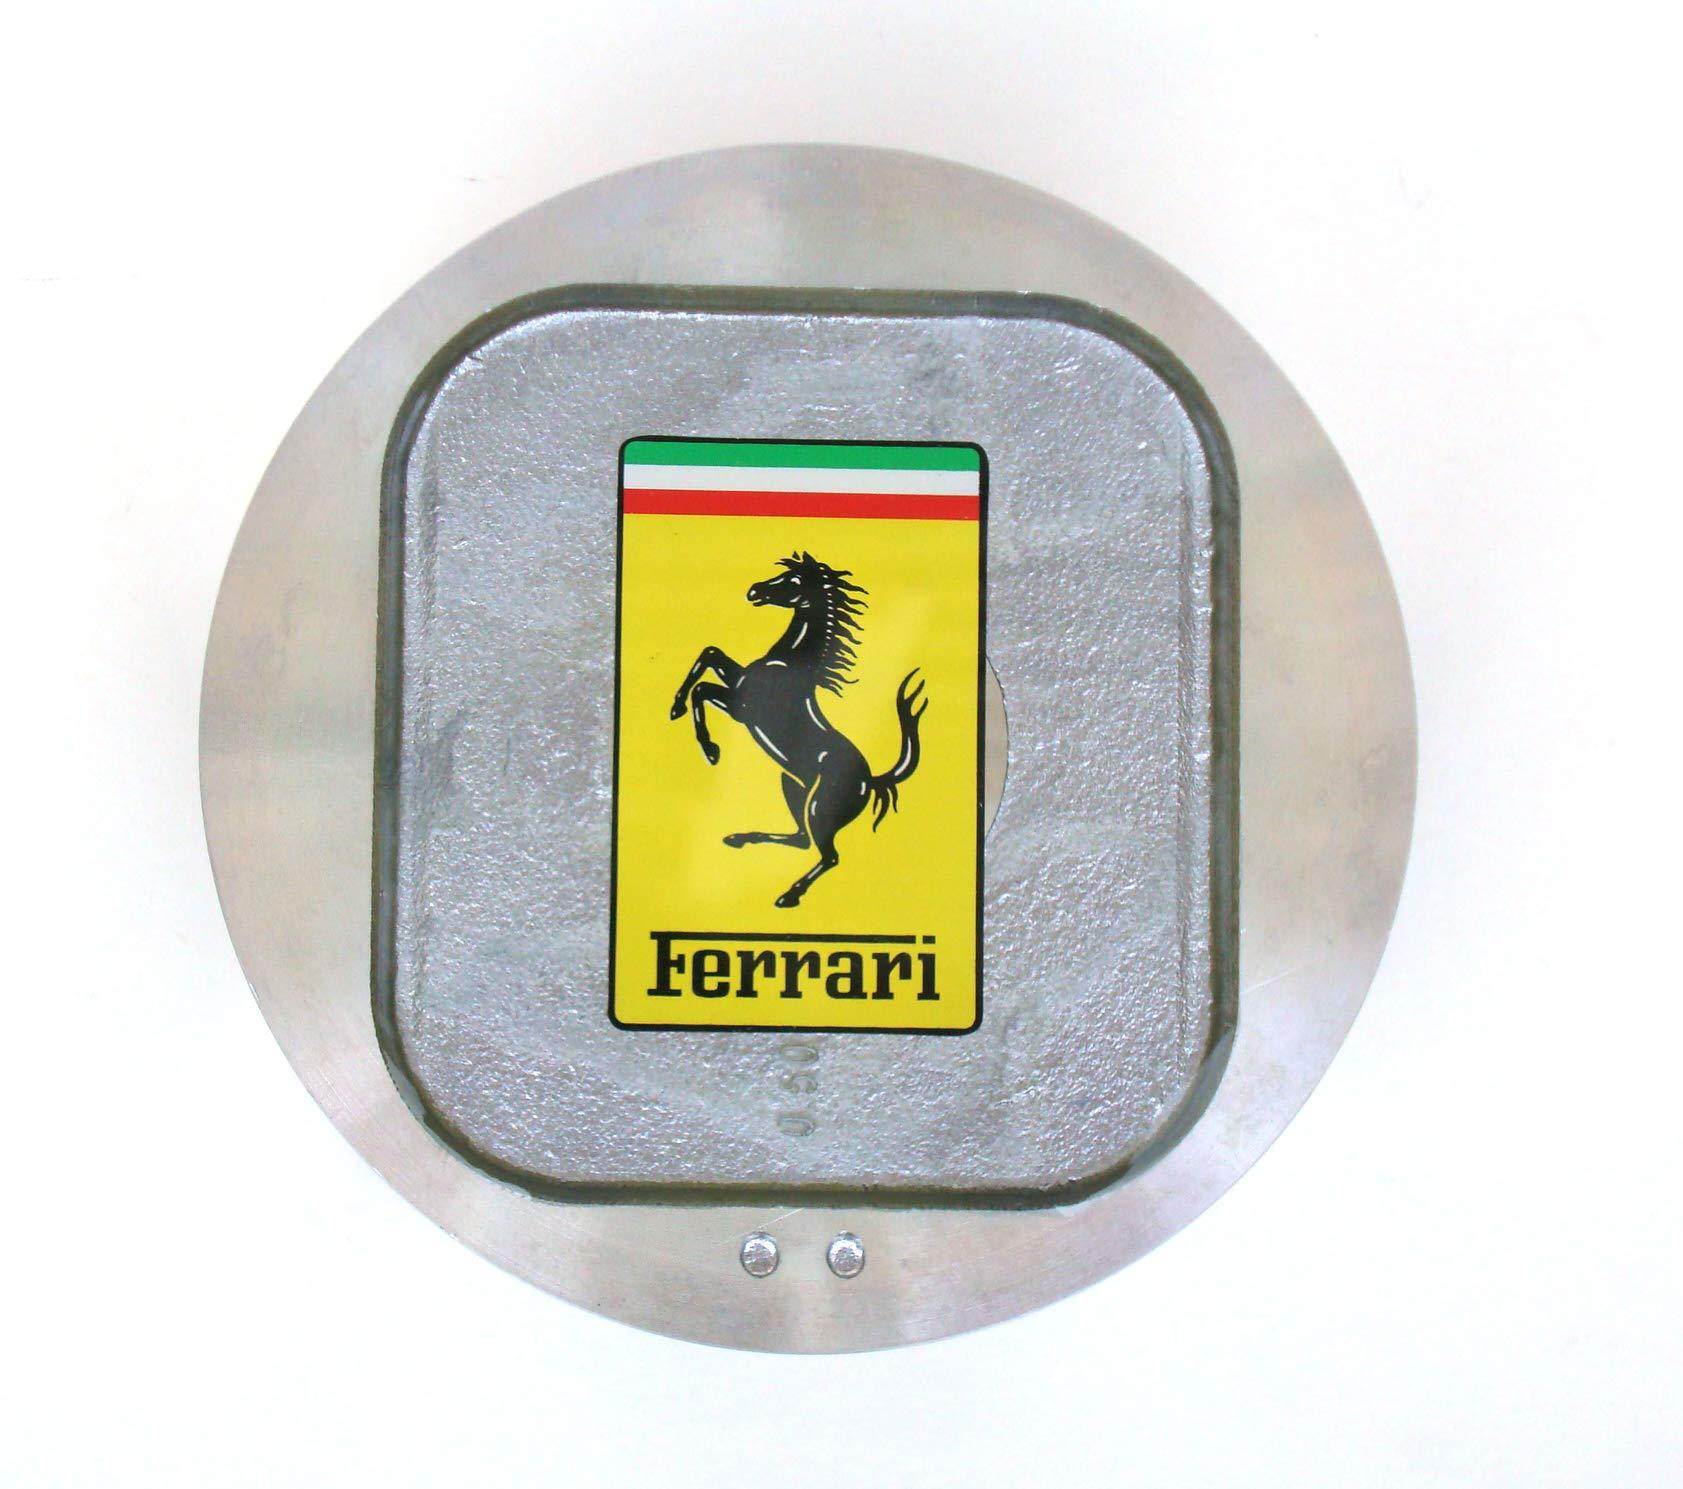 Italian Exotics Boutique Car Piston Paperweight with Ferrari Resin Decal